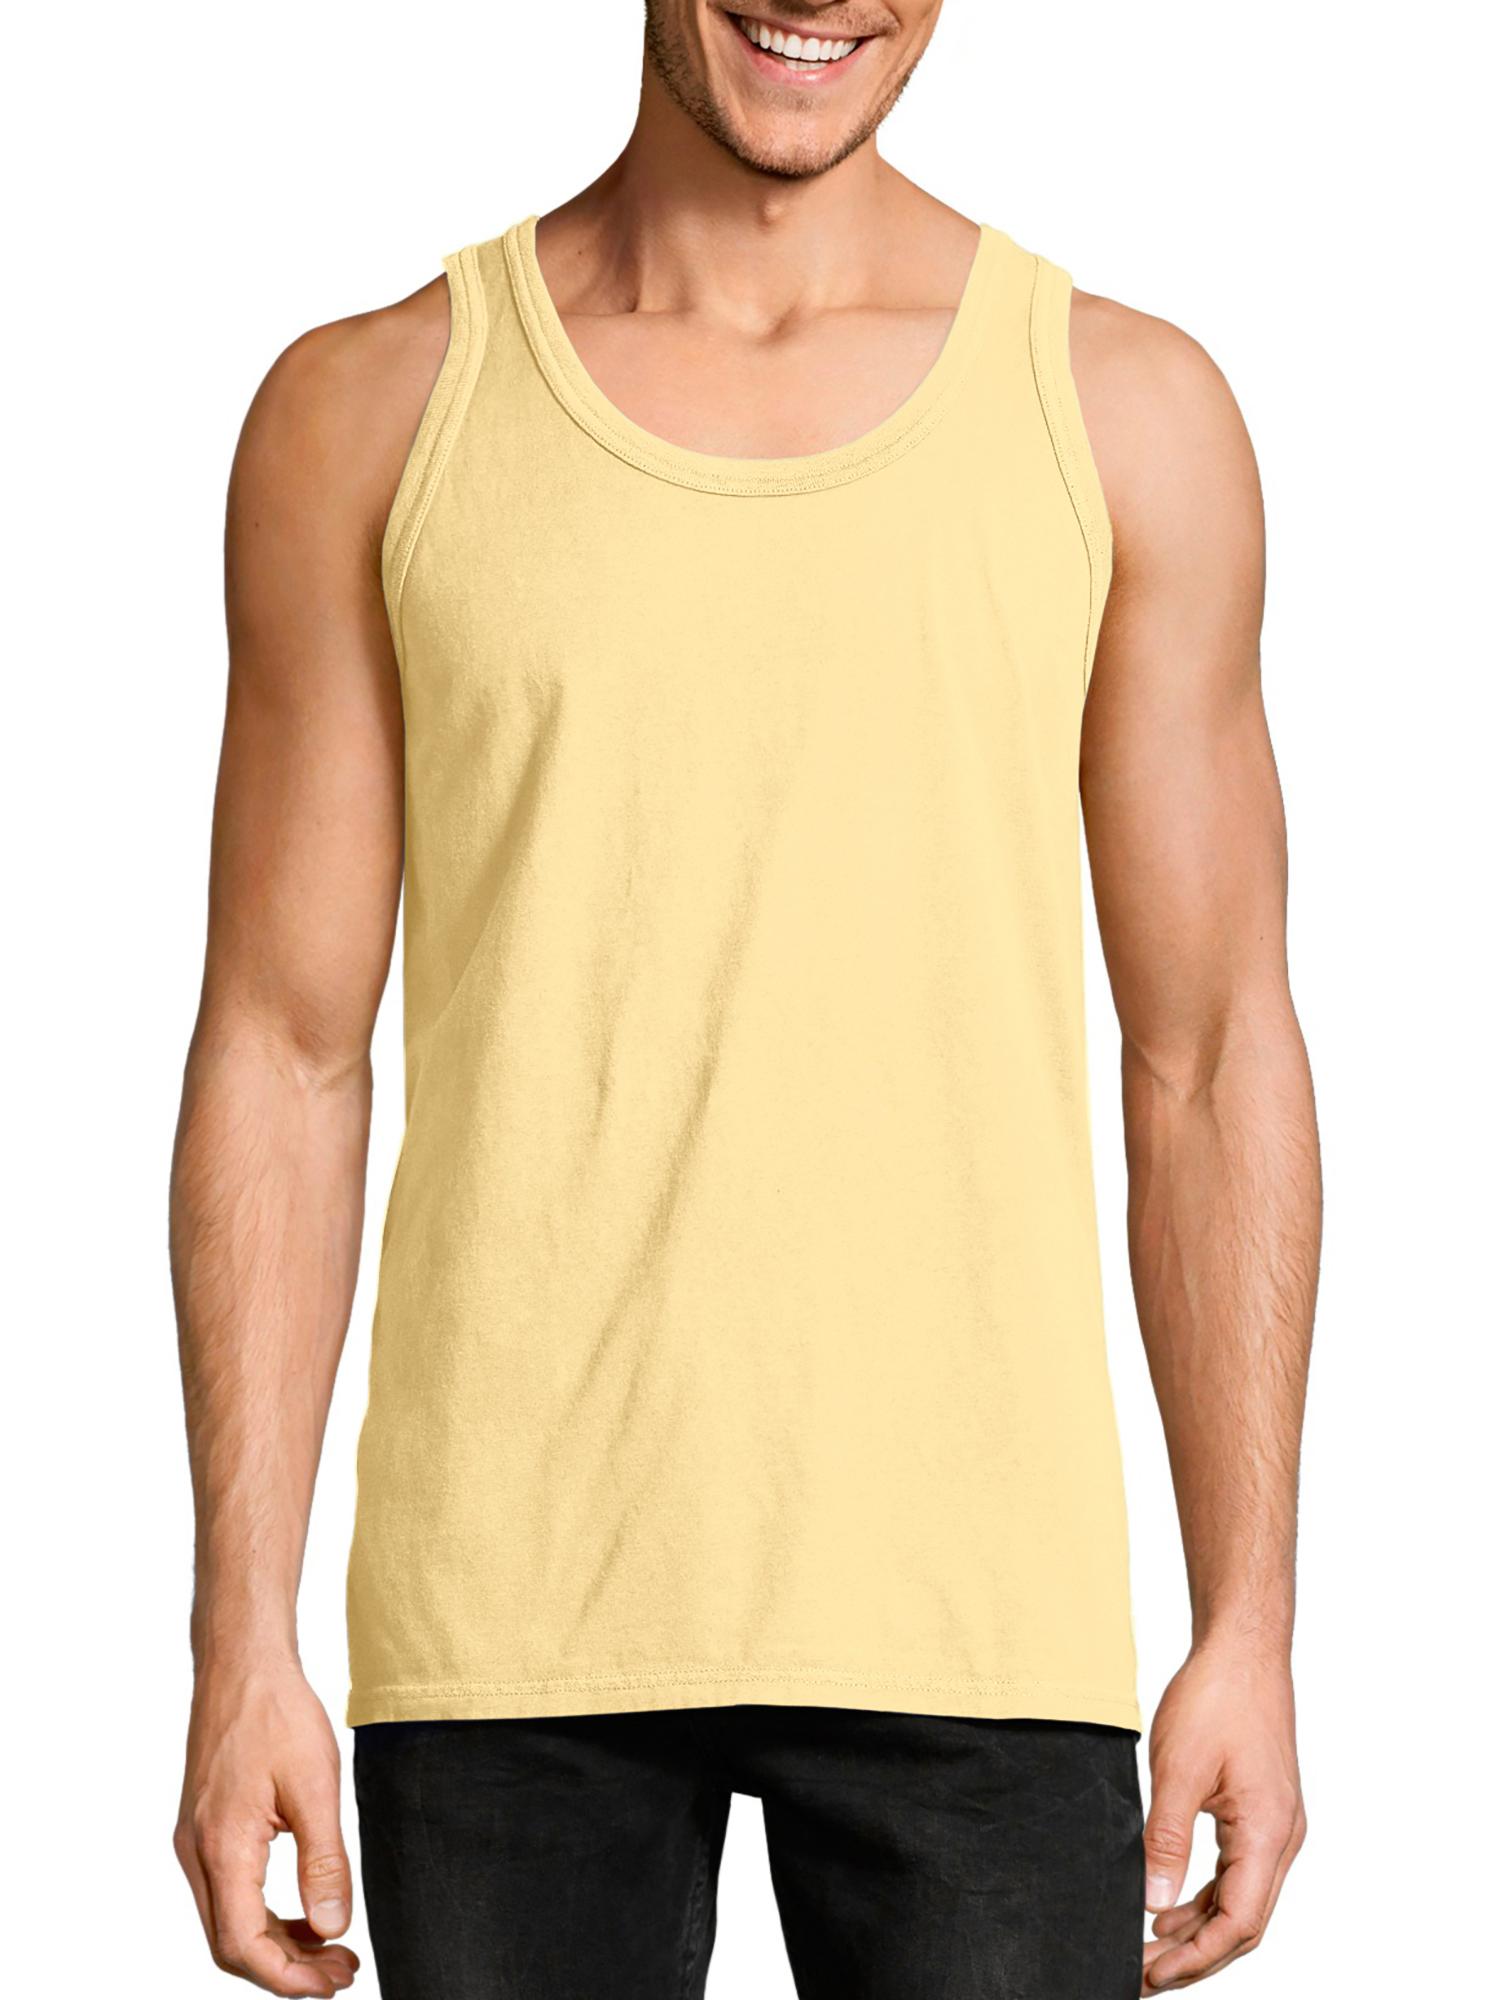 Big Men's ComfortWash Garment Dyed Sleeveless Tank Top